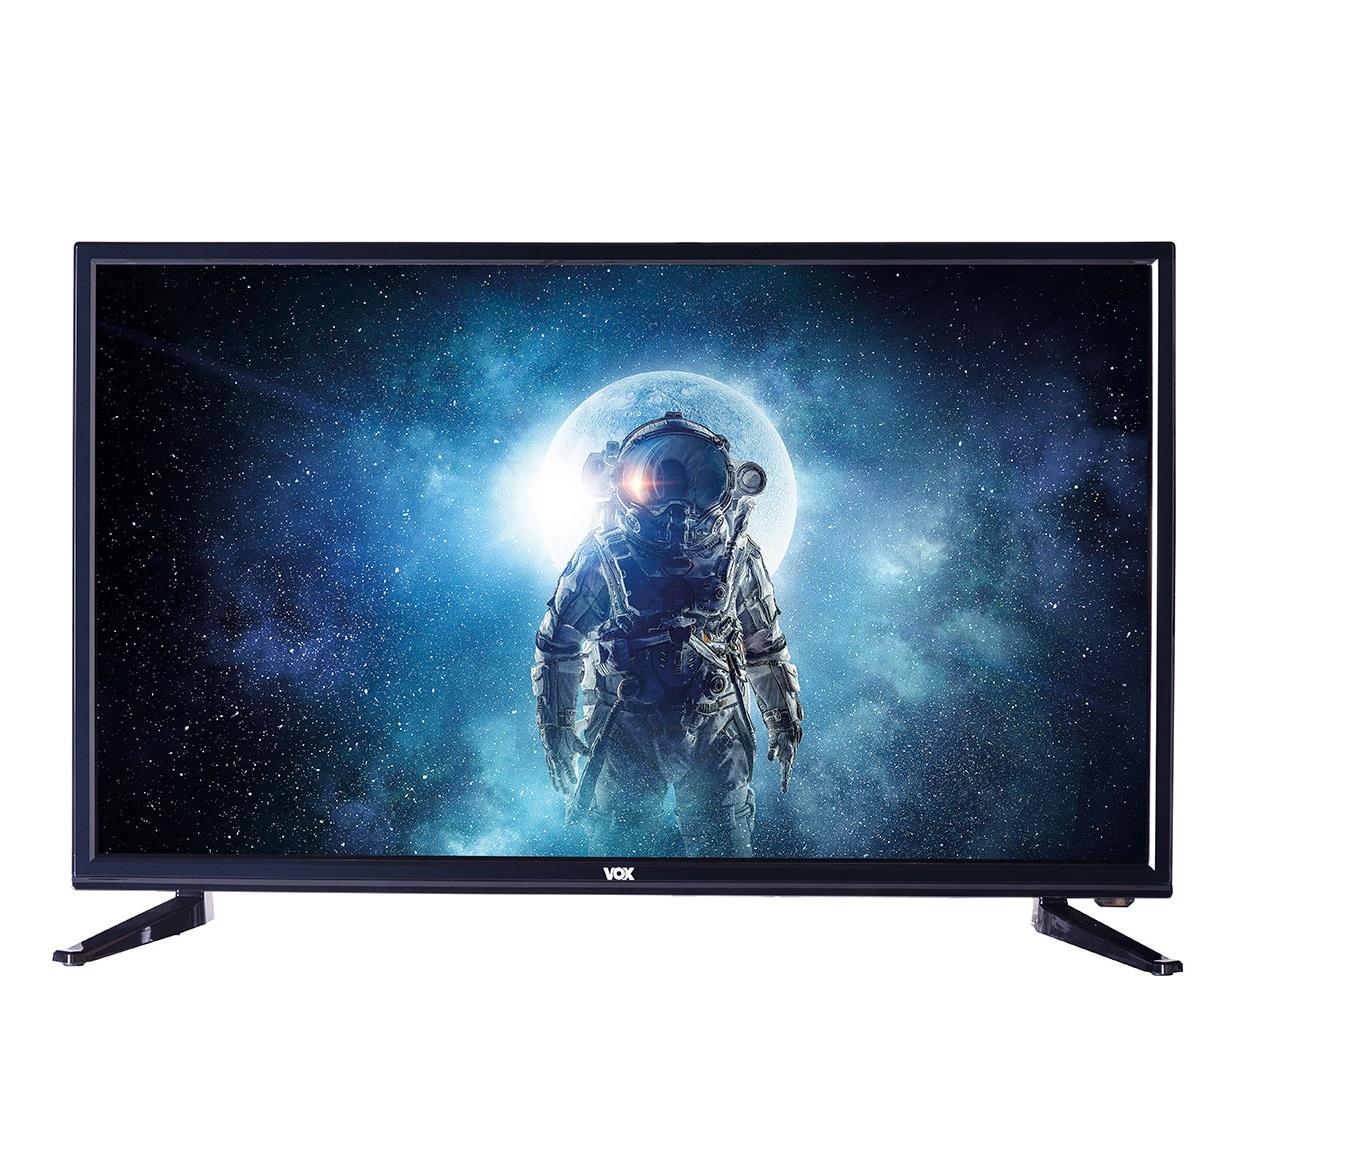 Vox LED TV 32DSA662Y